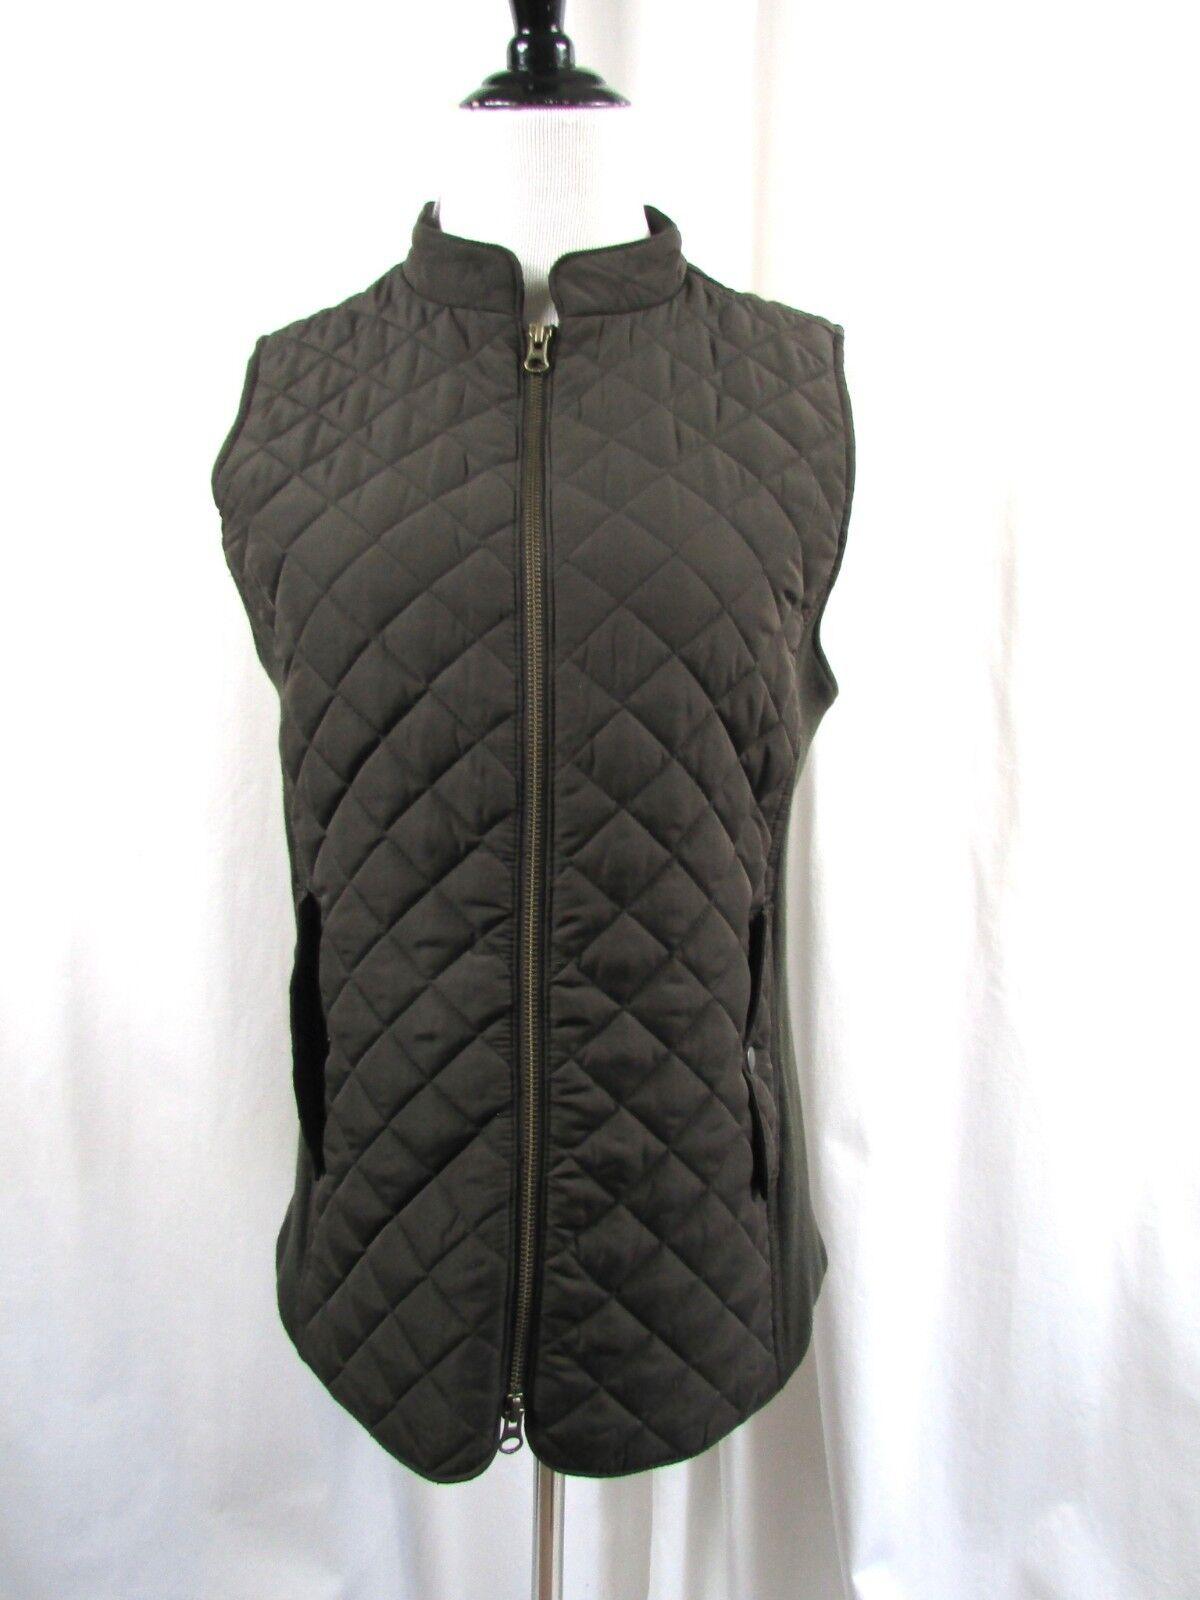 J Jill Brown Walnut Quilted Vest Size Medium M NWT NWT NWT c80e53